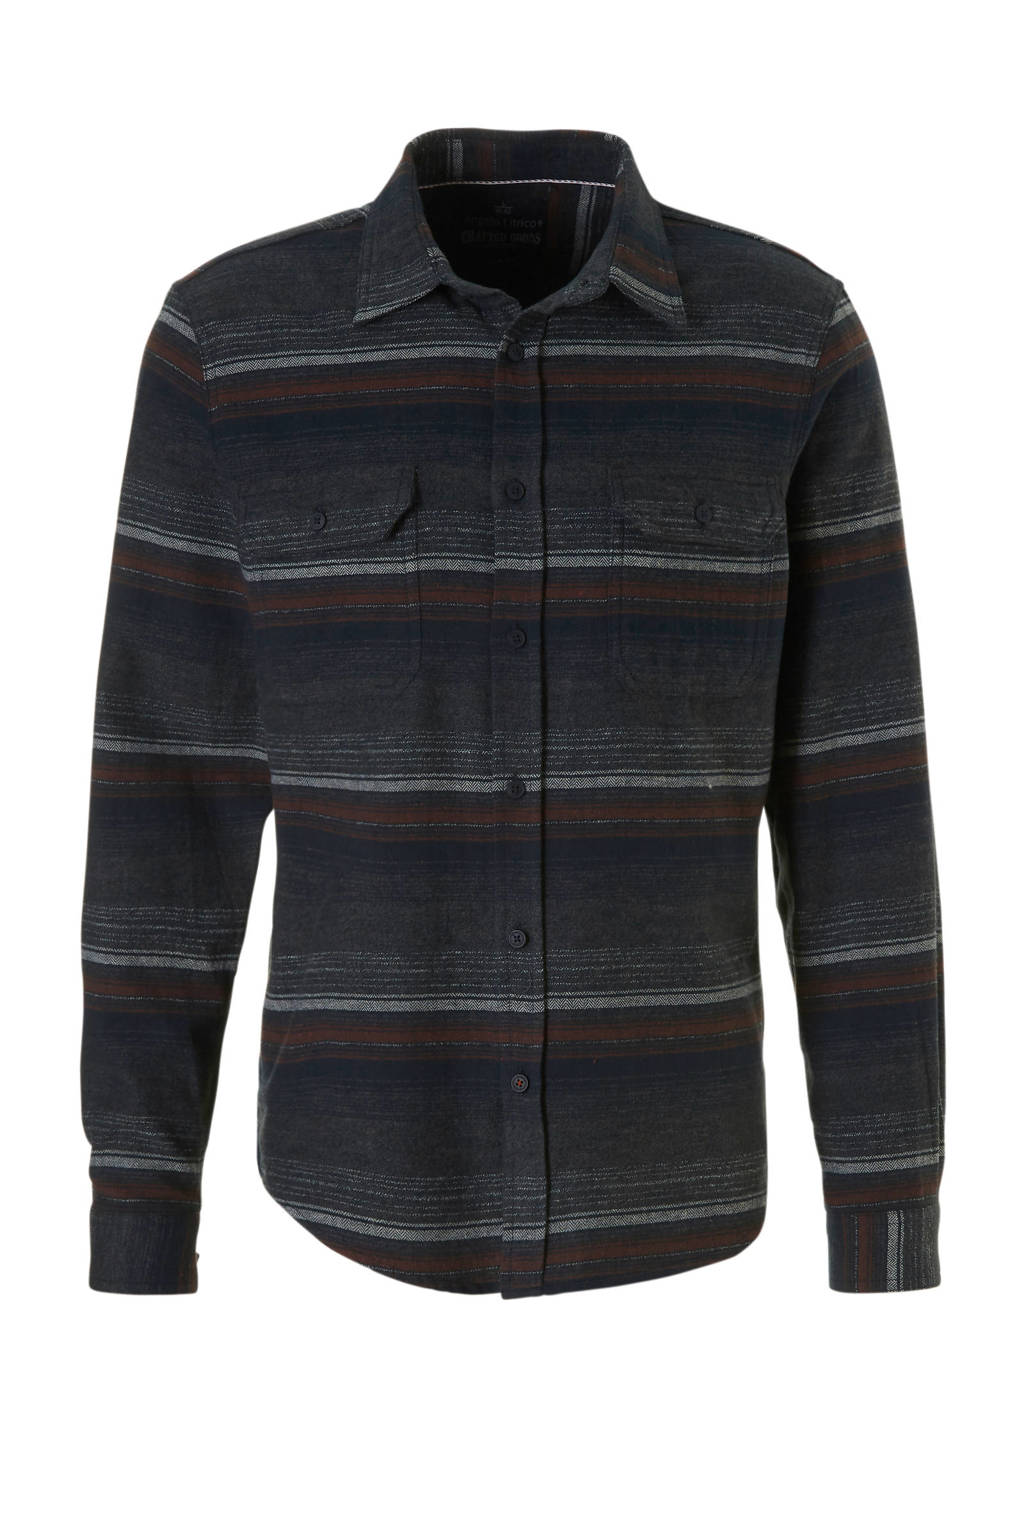 C&A Angelo Litrico flanellen overhemd, Zwart